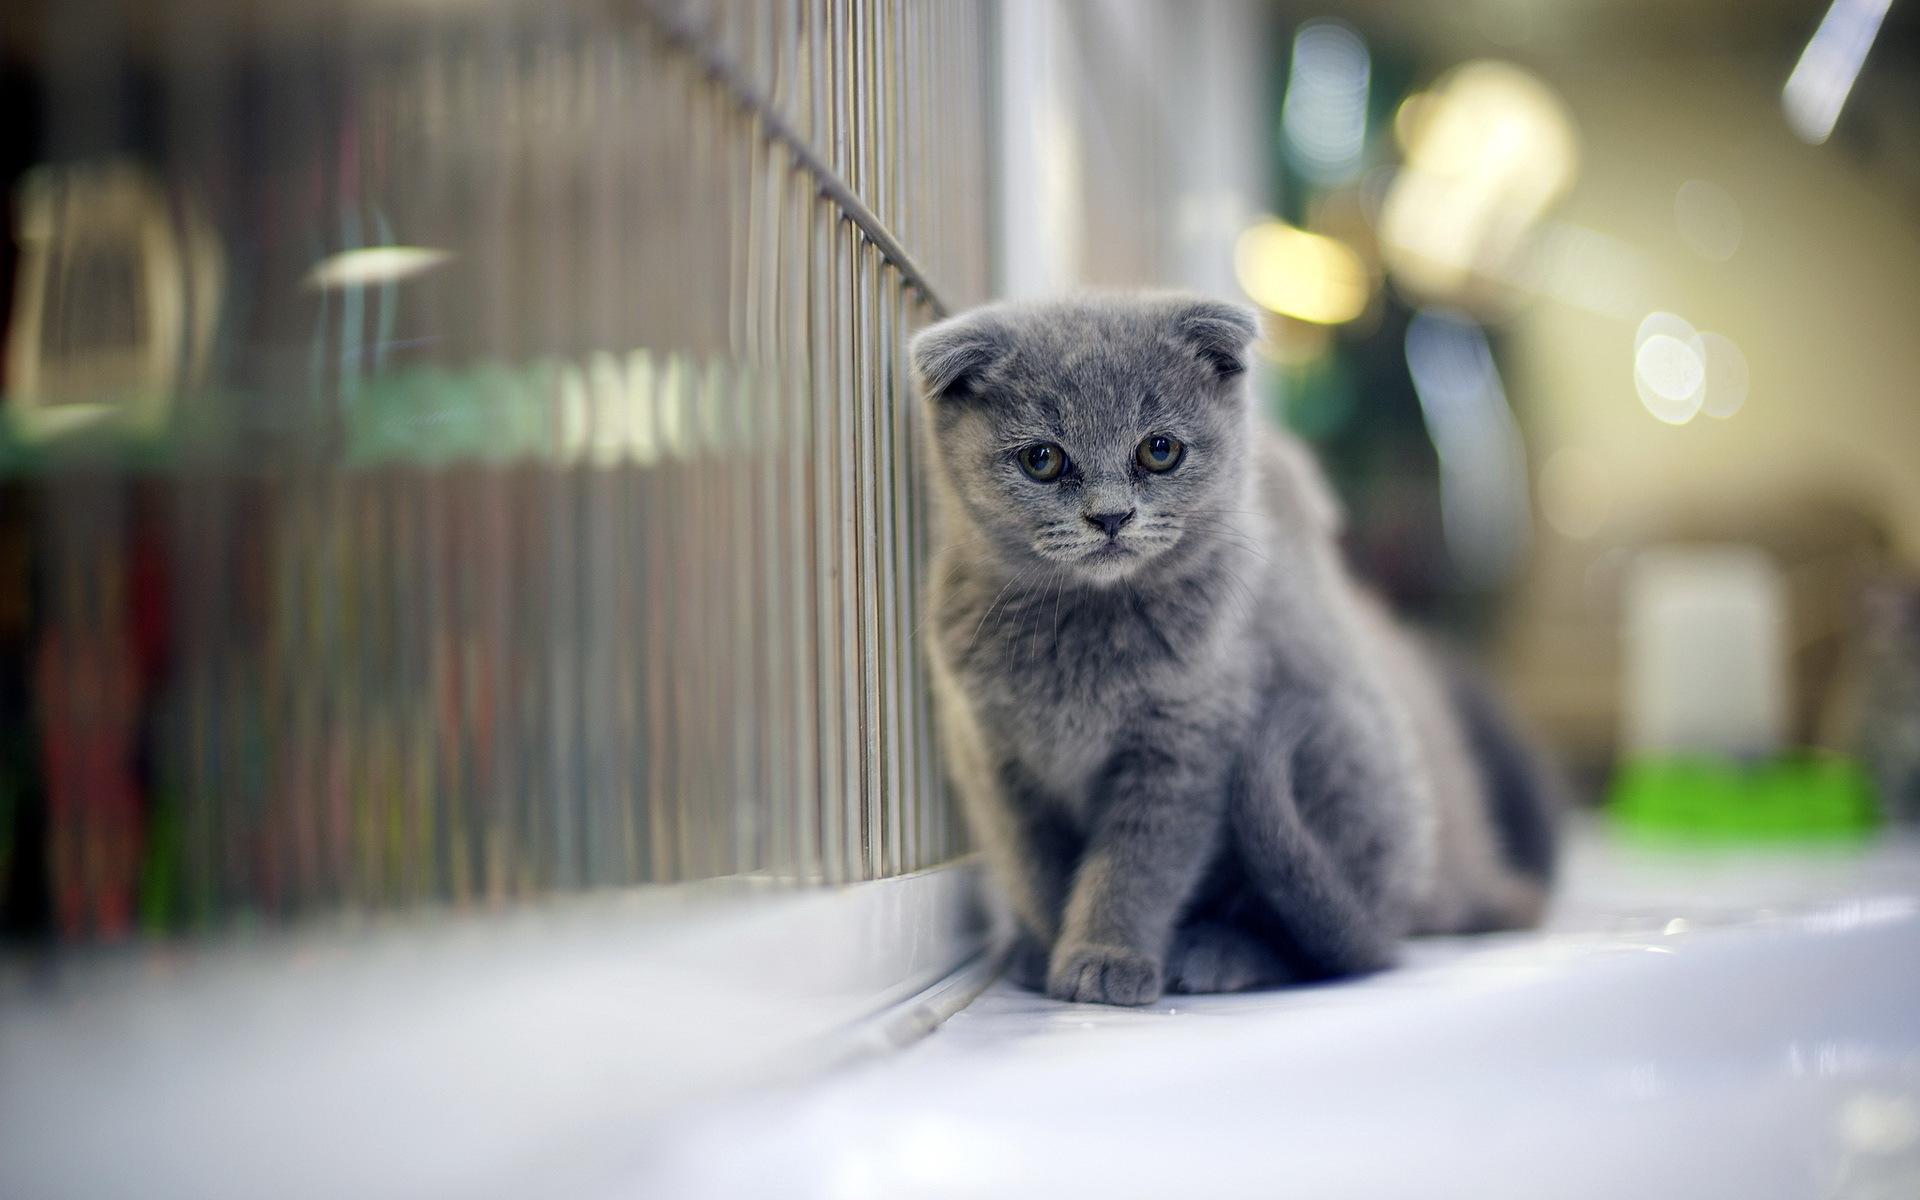 Wallpaper 1920x1200 Px Babies Baby Cat Cats Cute Eyes Kitten Kittens Pov 1920x1200 4kwallpaper 1640685 Hd Wallpapers Wallhere